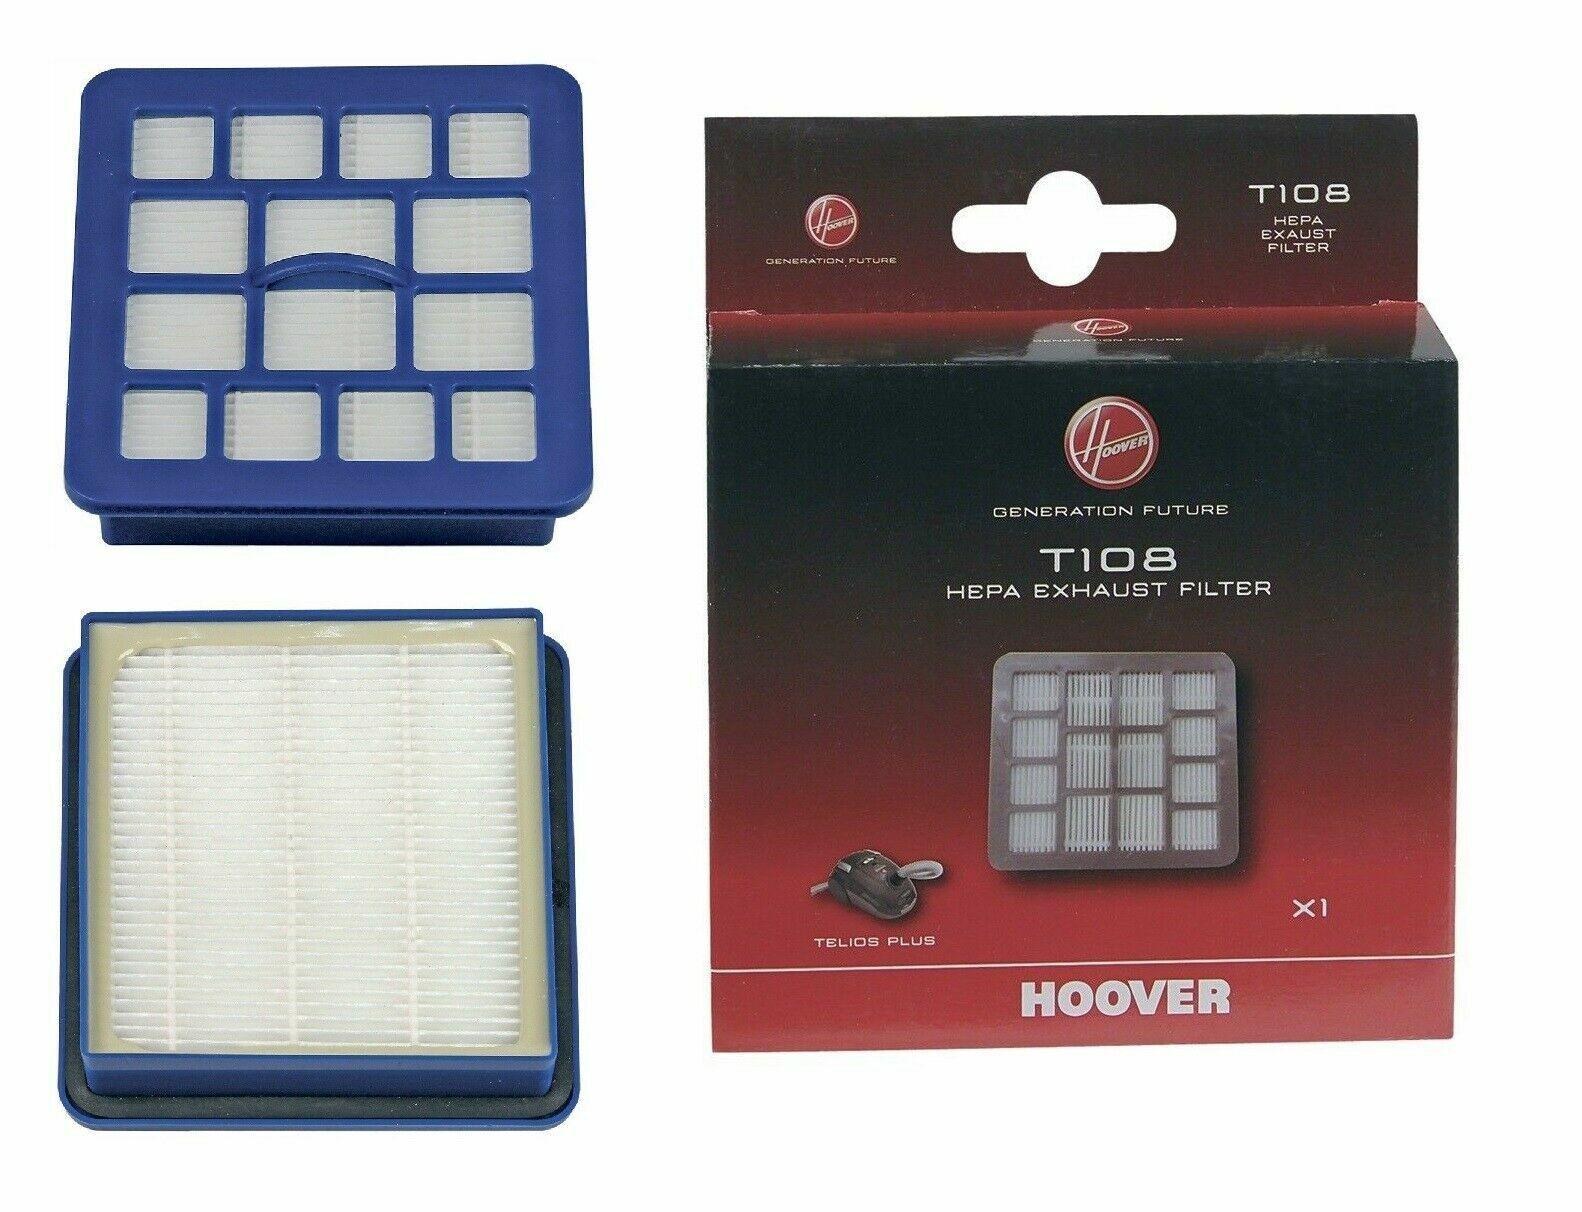 Hoover 35601289,T108 HEPA-Filter für TE70.. Telios Plus Bodenstaubsauger